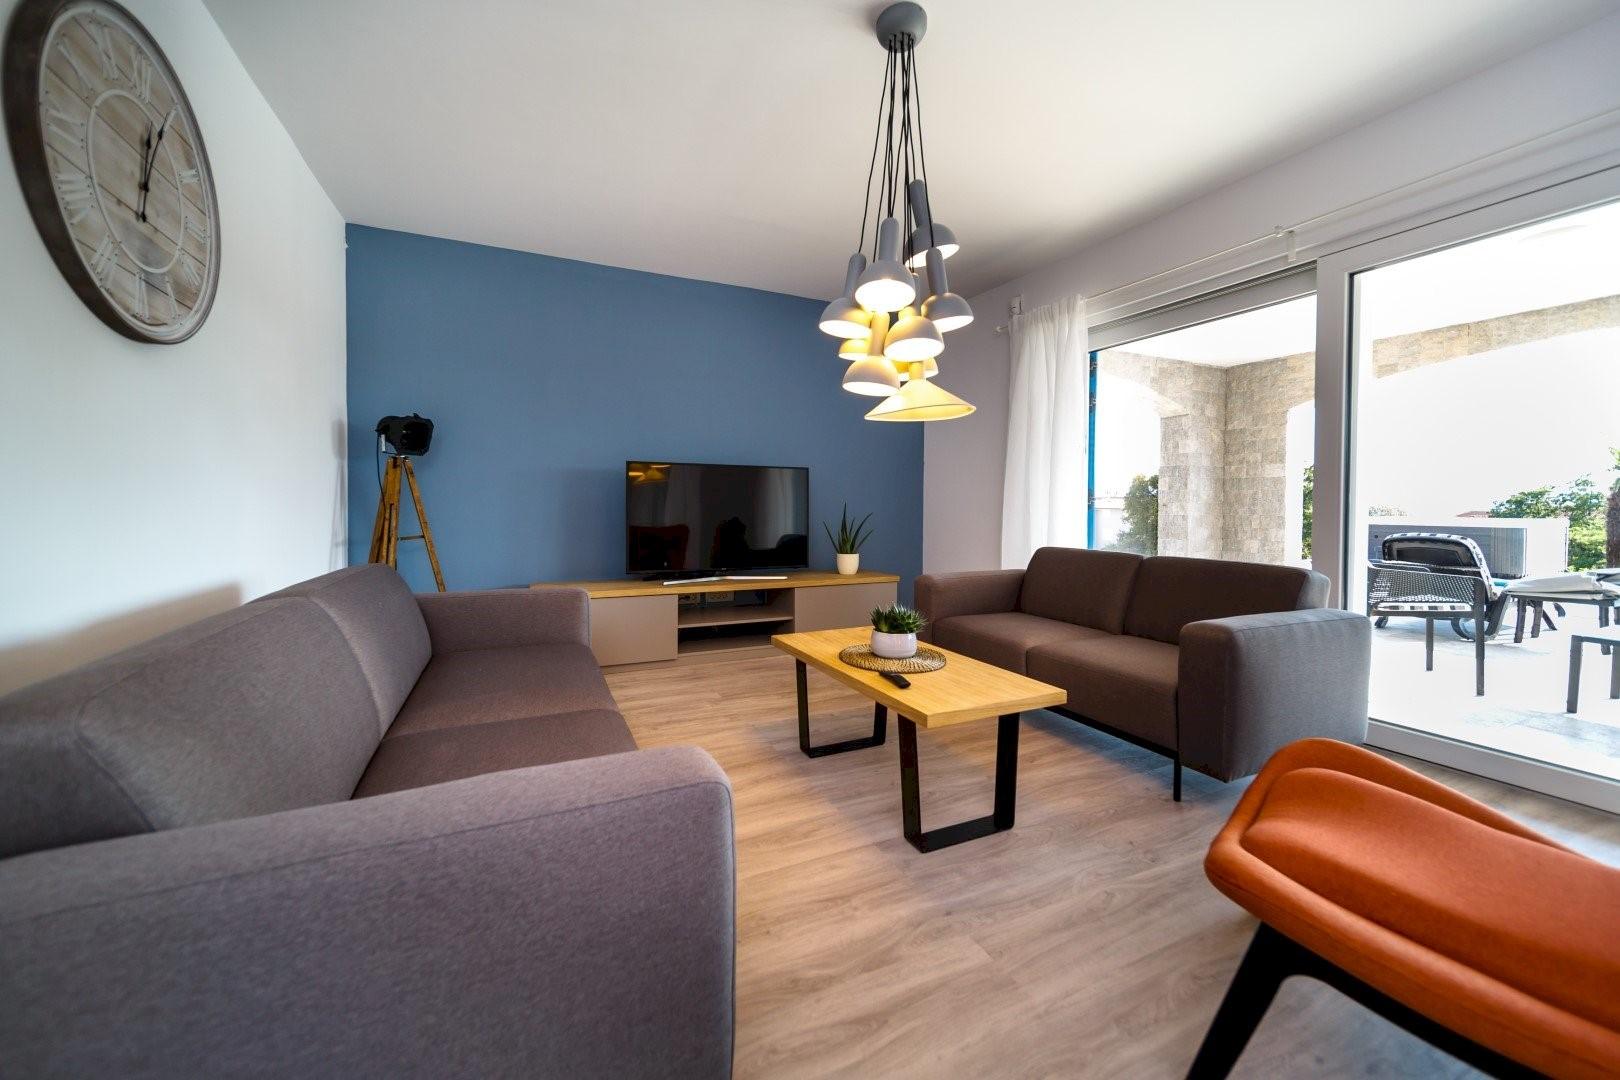 Ferienhaus Luxury Villa Loma 2 (2586643), Sveti Vid-Miholjice, Insel Krk, Kvarner, Kroatien, Bild 6